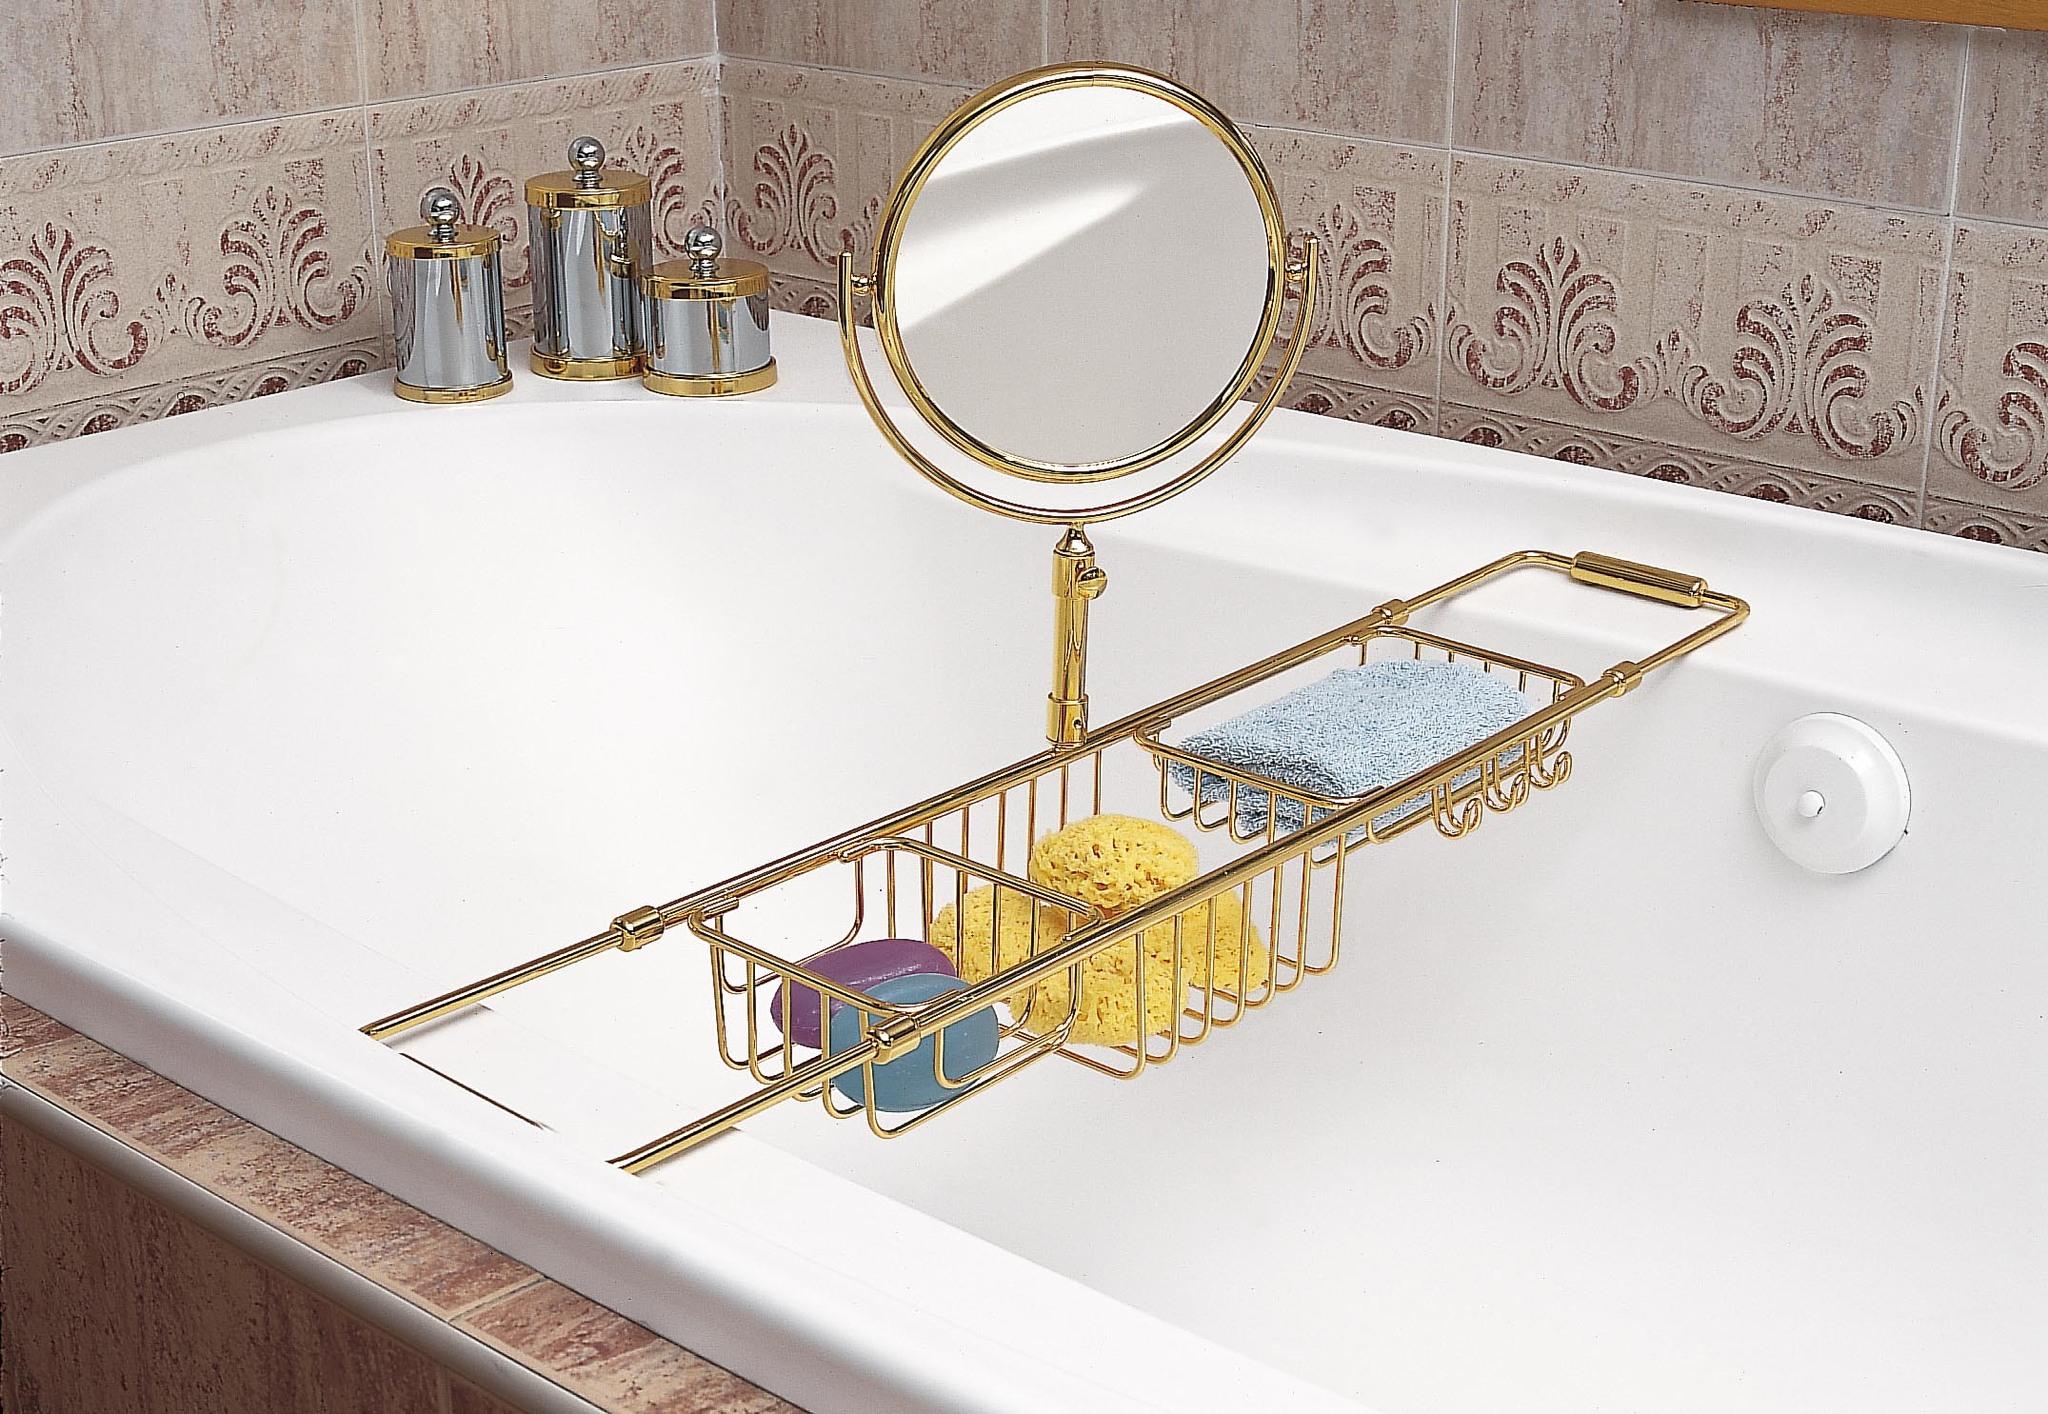 Ванная Полка на ванну Windisch 85105O polka-na-vannu-85105-ot-windisch-ispaniya-vid.JPG